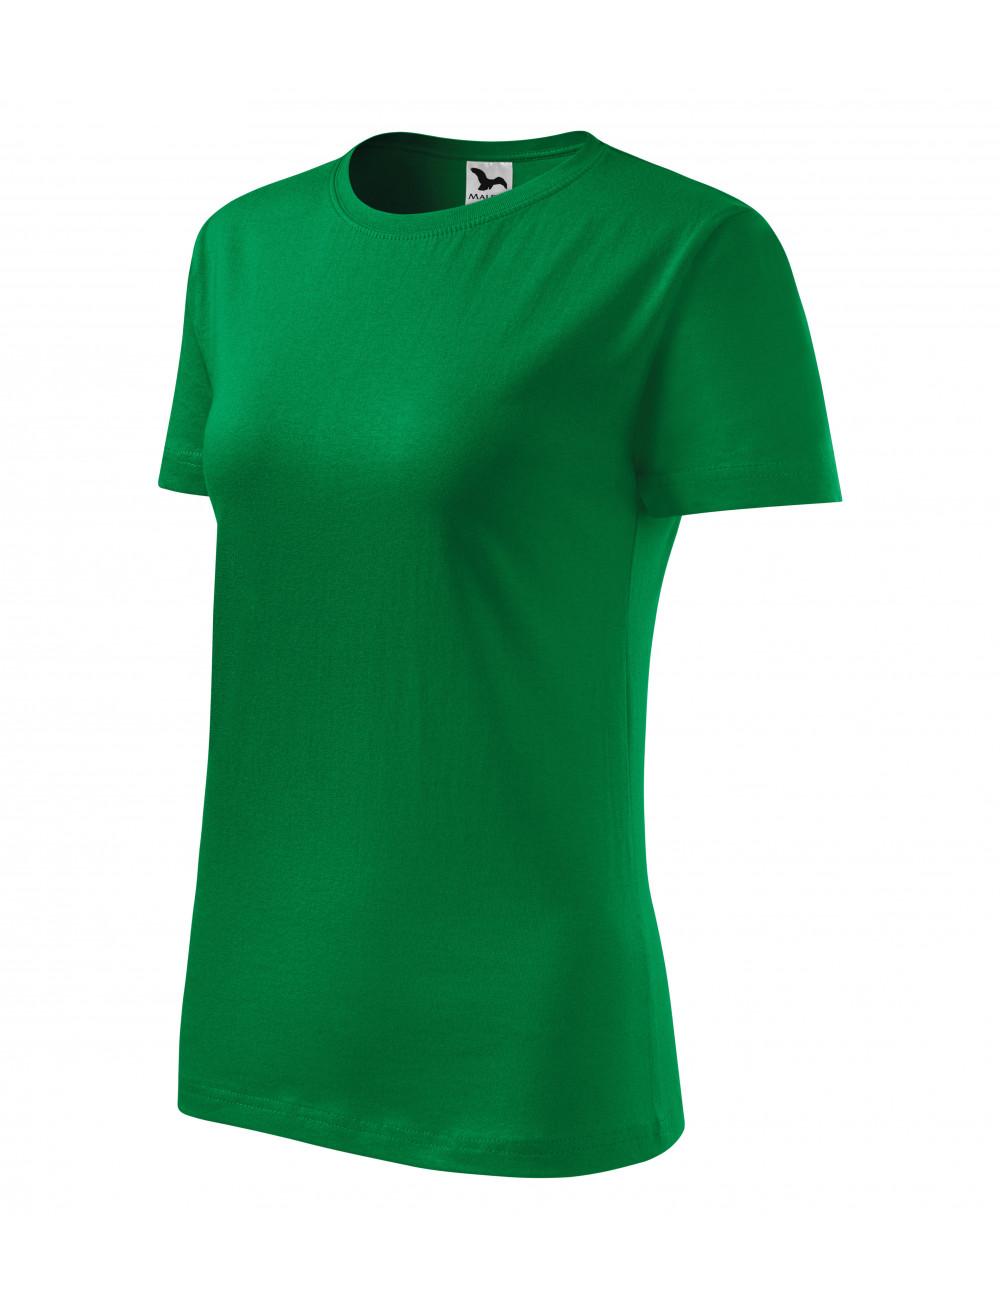 Adler MALFINI Koszulka damska Classic New 133 zieleń trawy